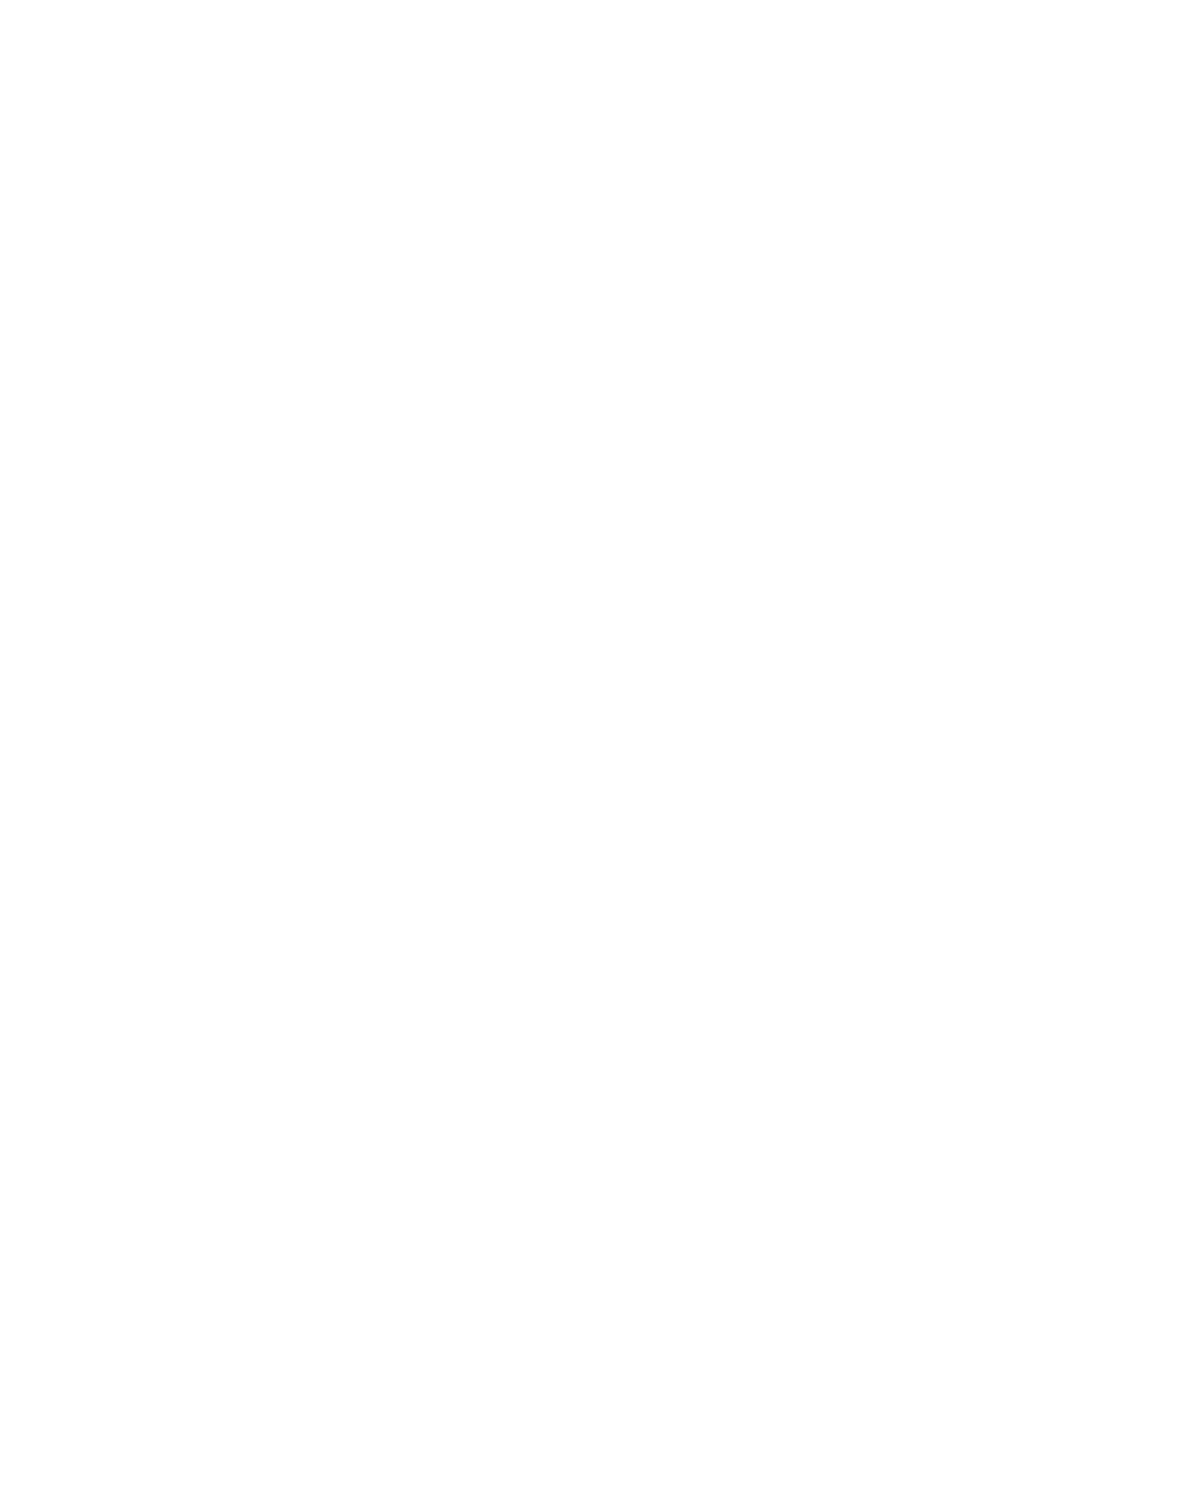 Hustle Tov Logo